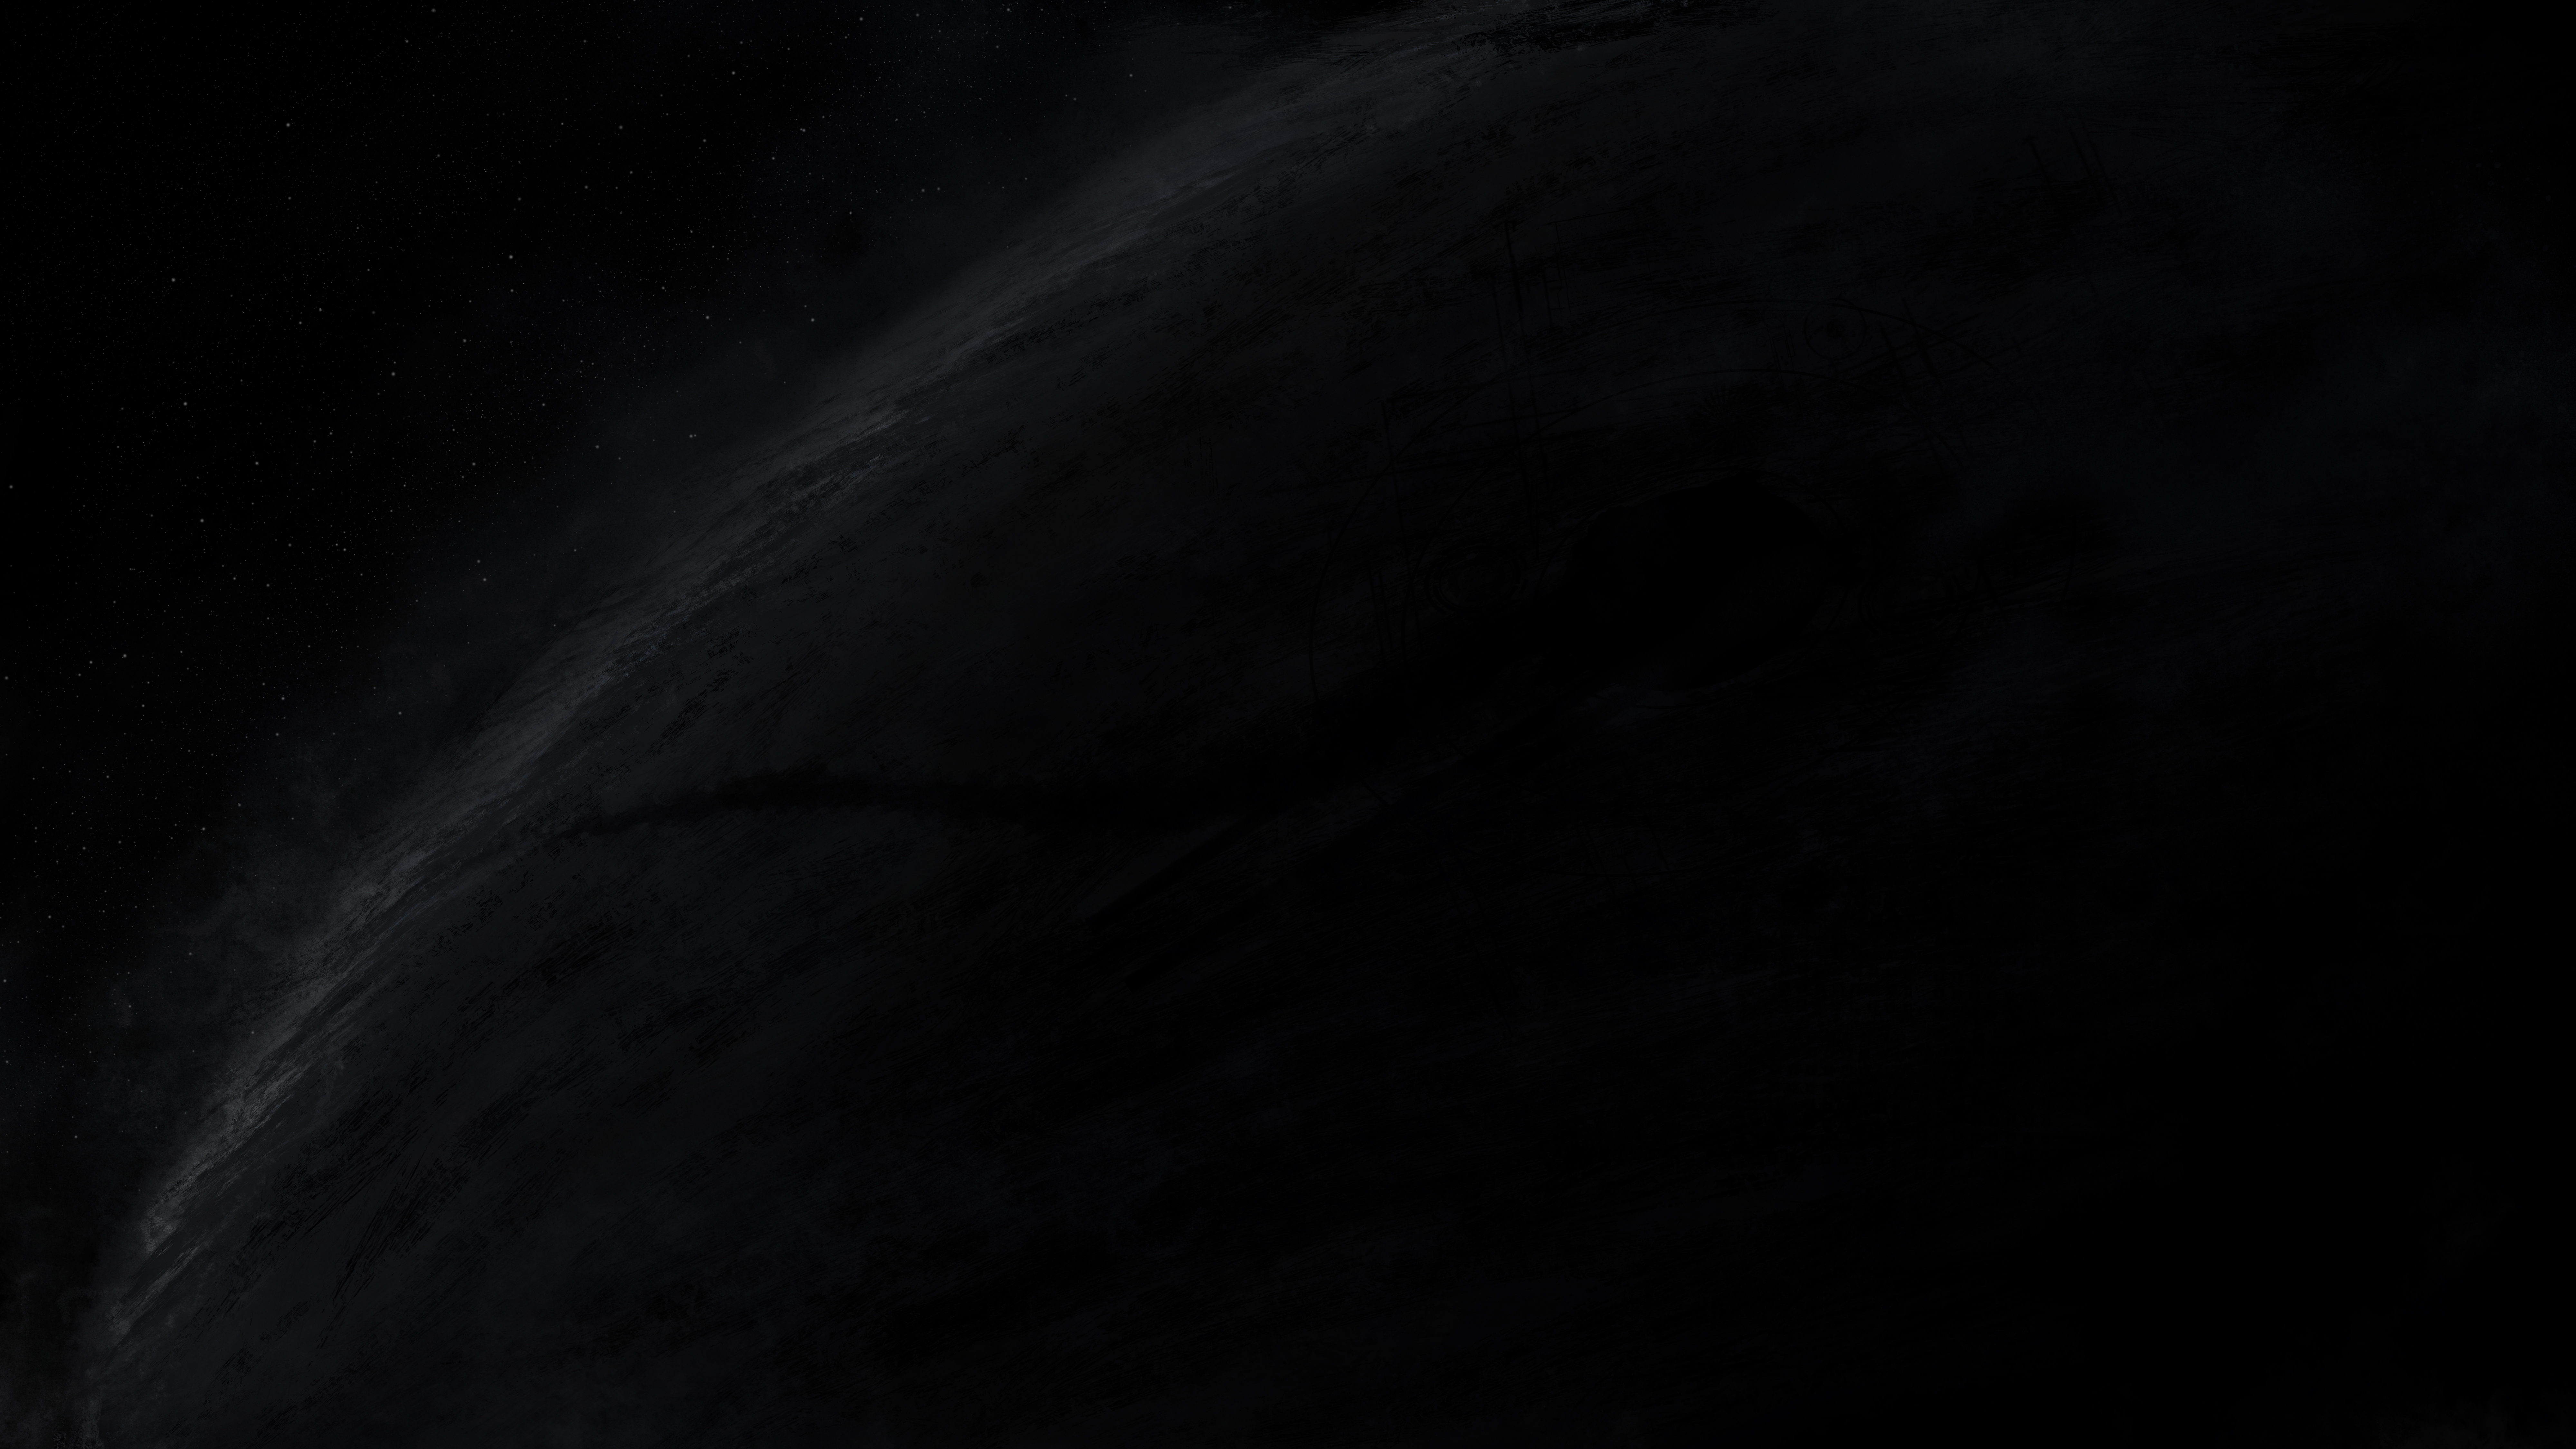 1600x900 Dark Black Simple Background 8k 1600x900 Resolution Hd 4k